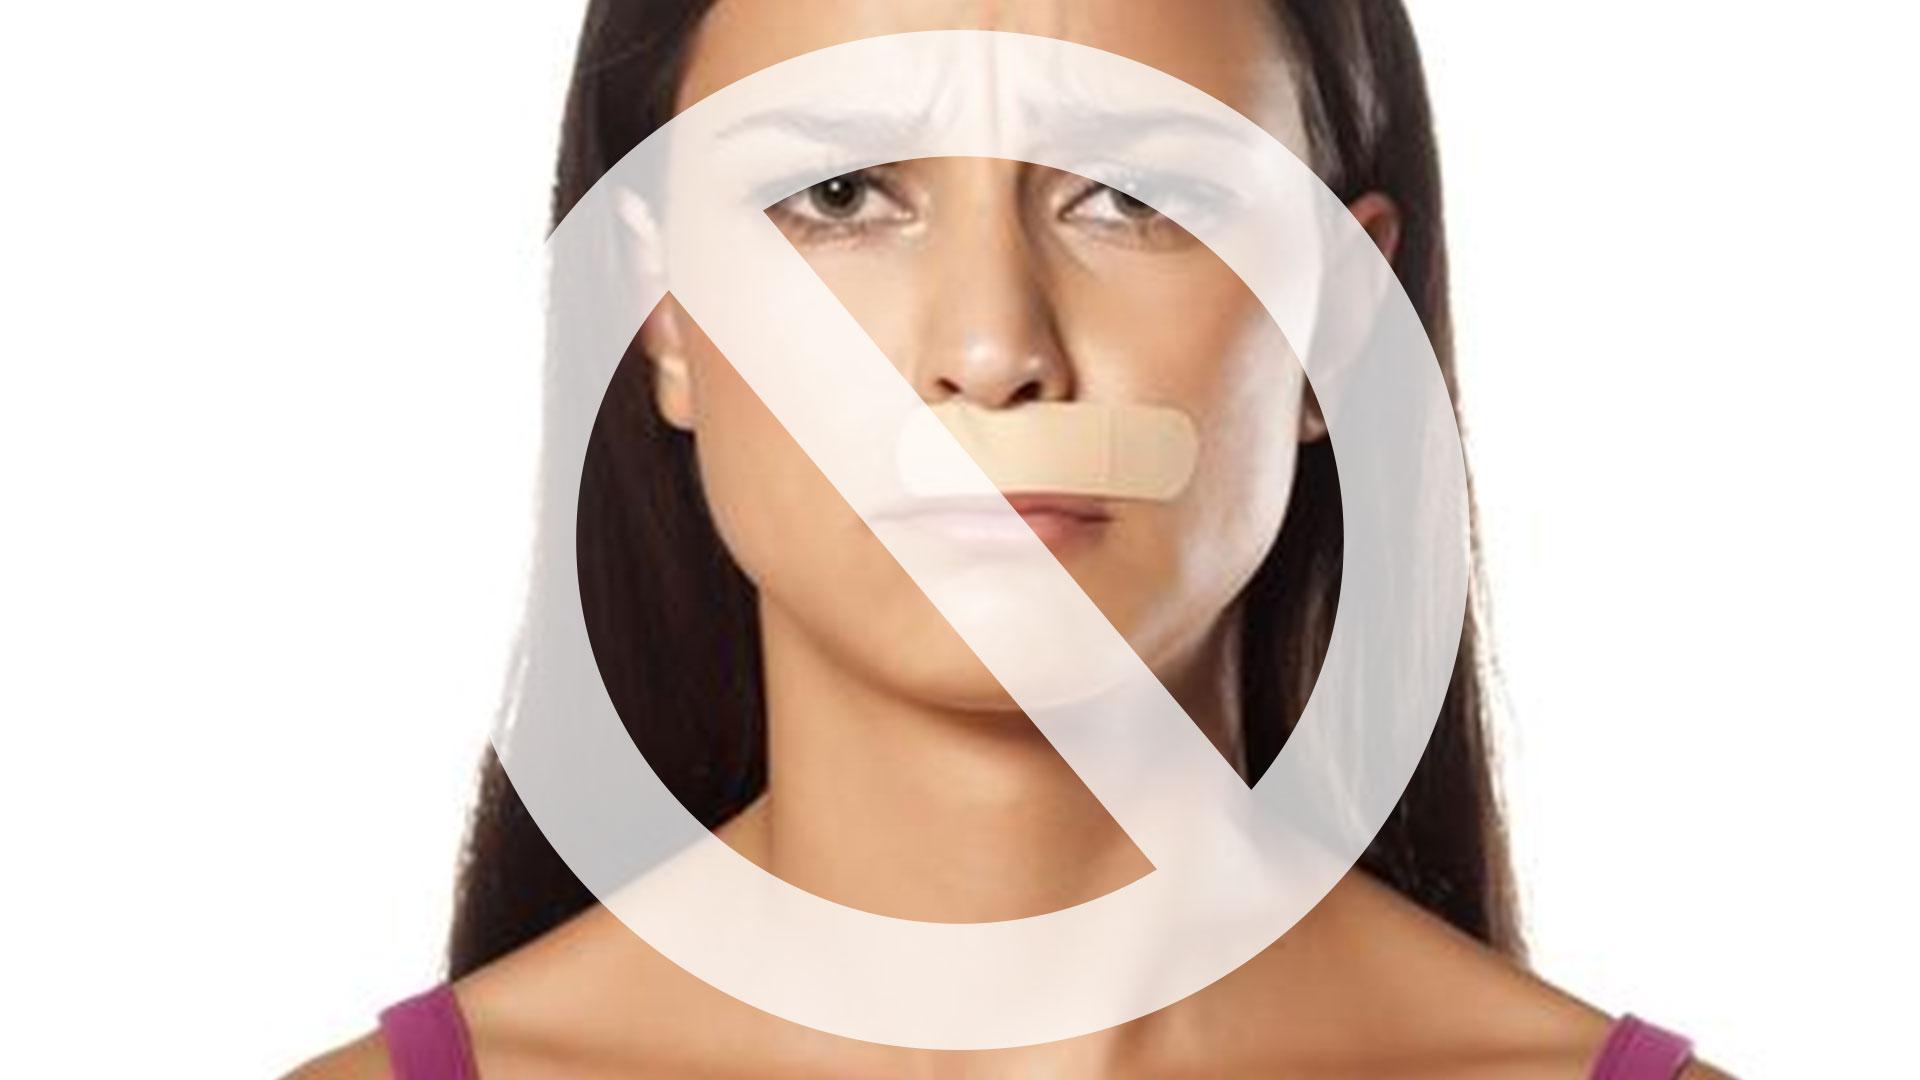 Dark Skin Hair Removal | Permanent Hair Removal in Chantilly, VA